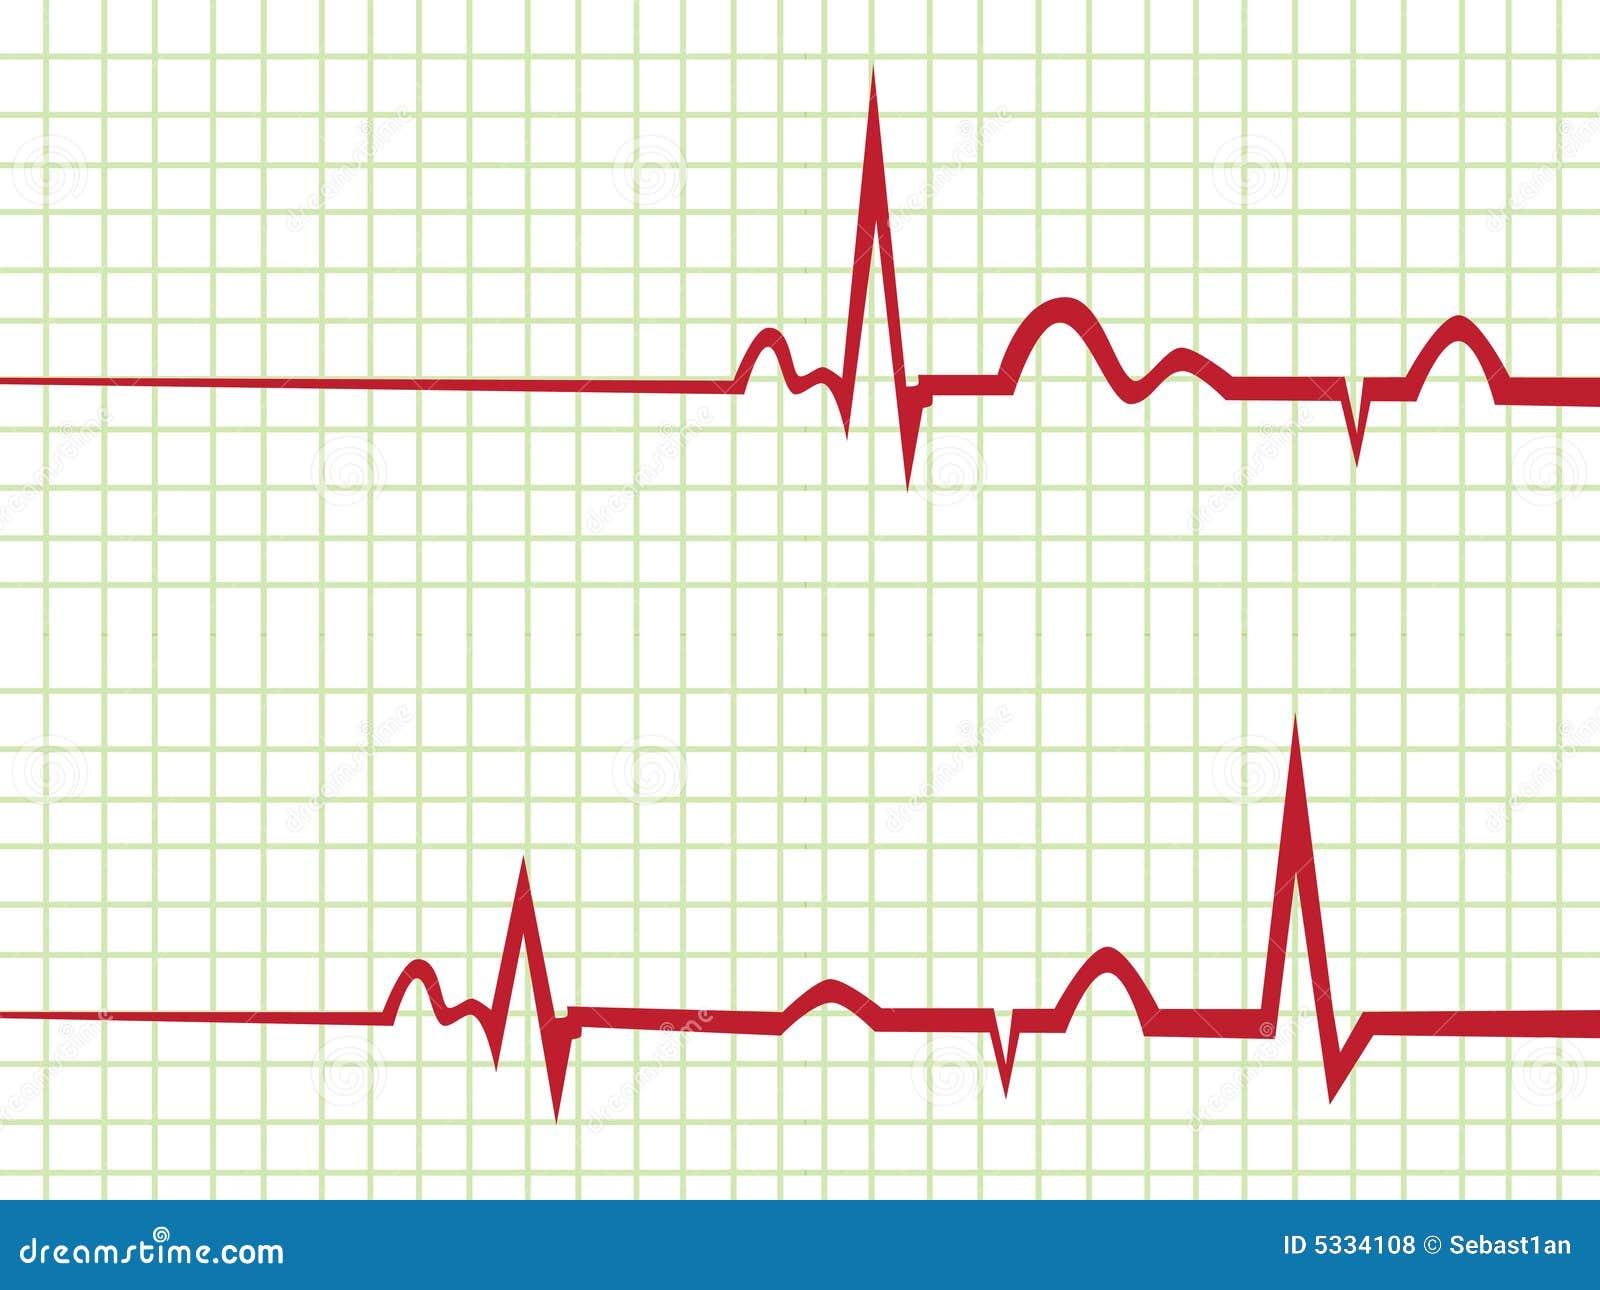 free heart monitor clipart - photo #39